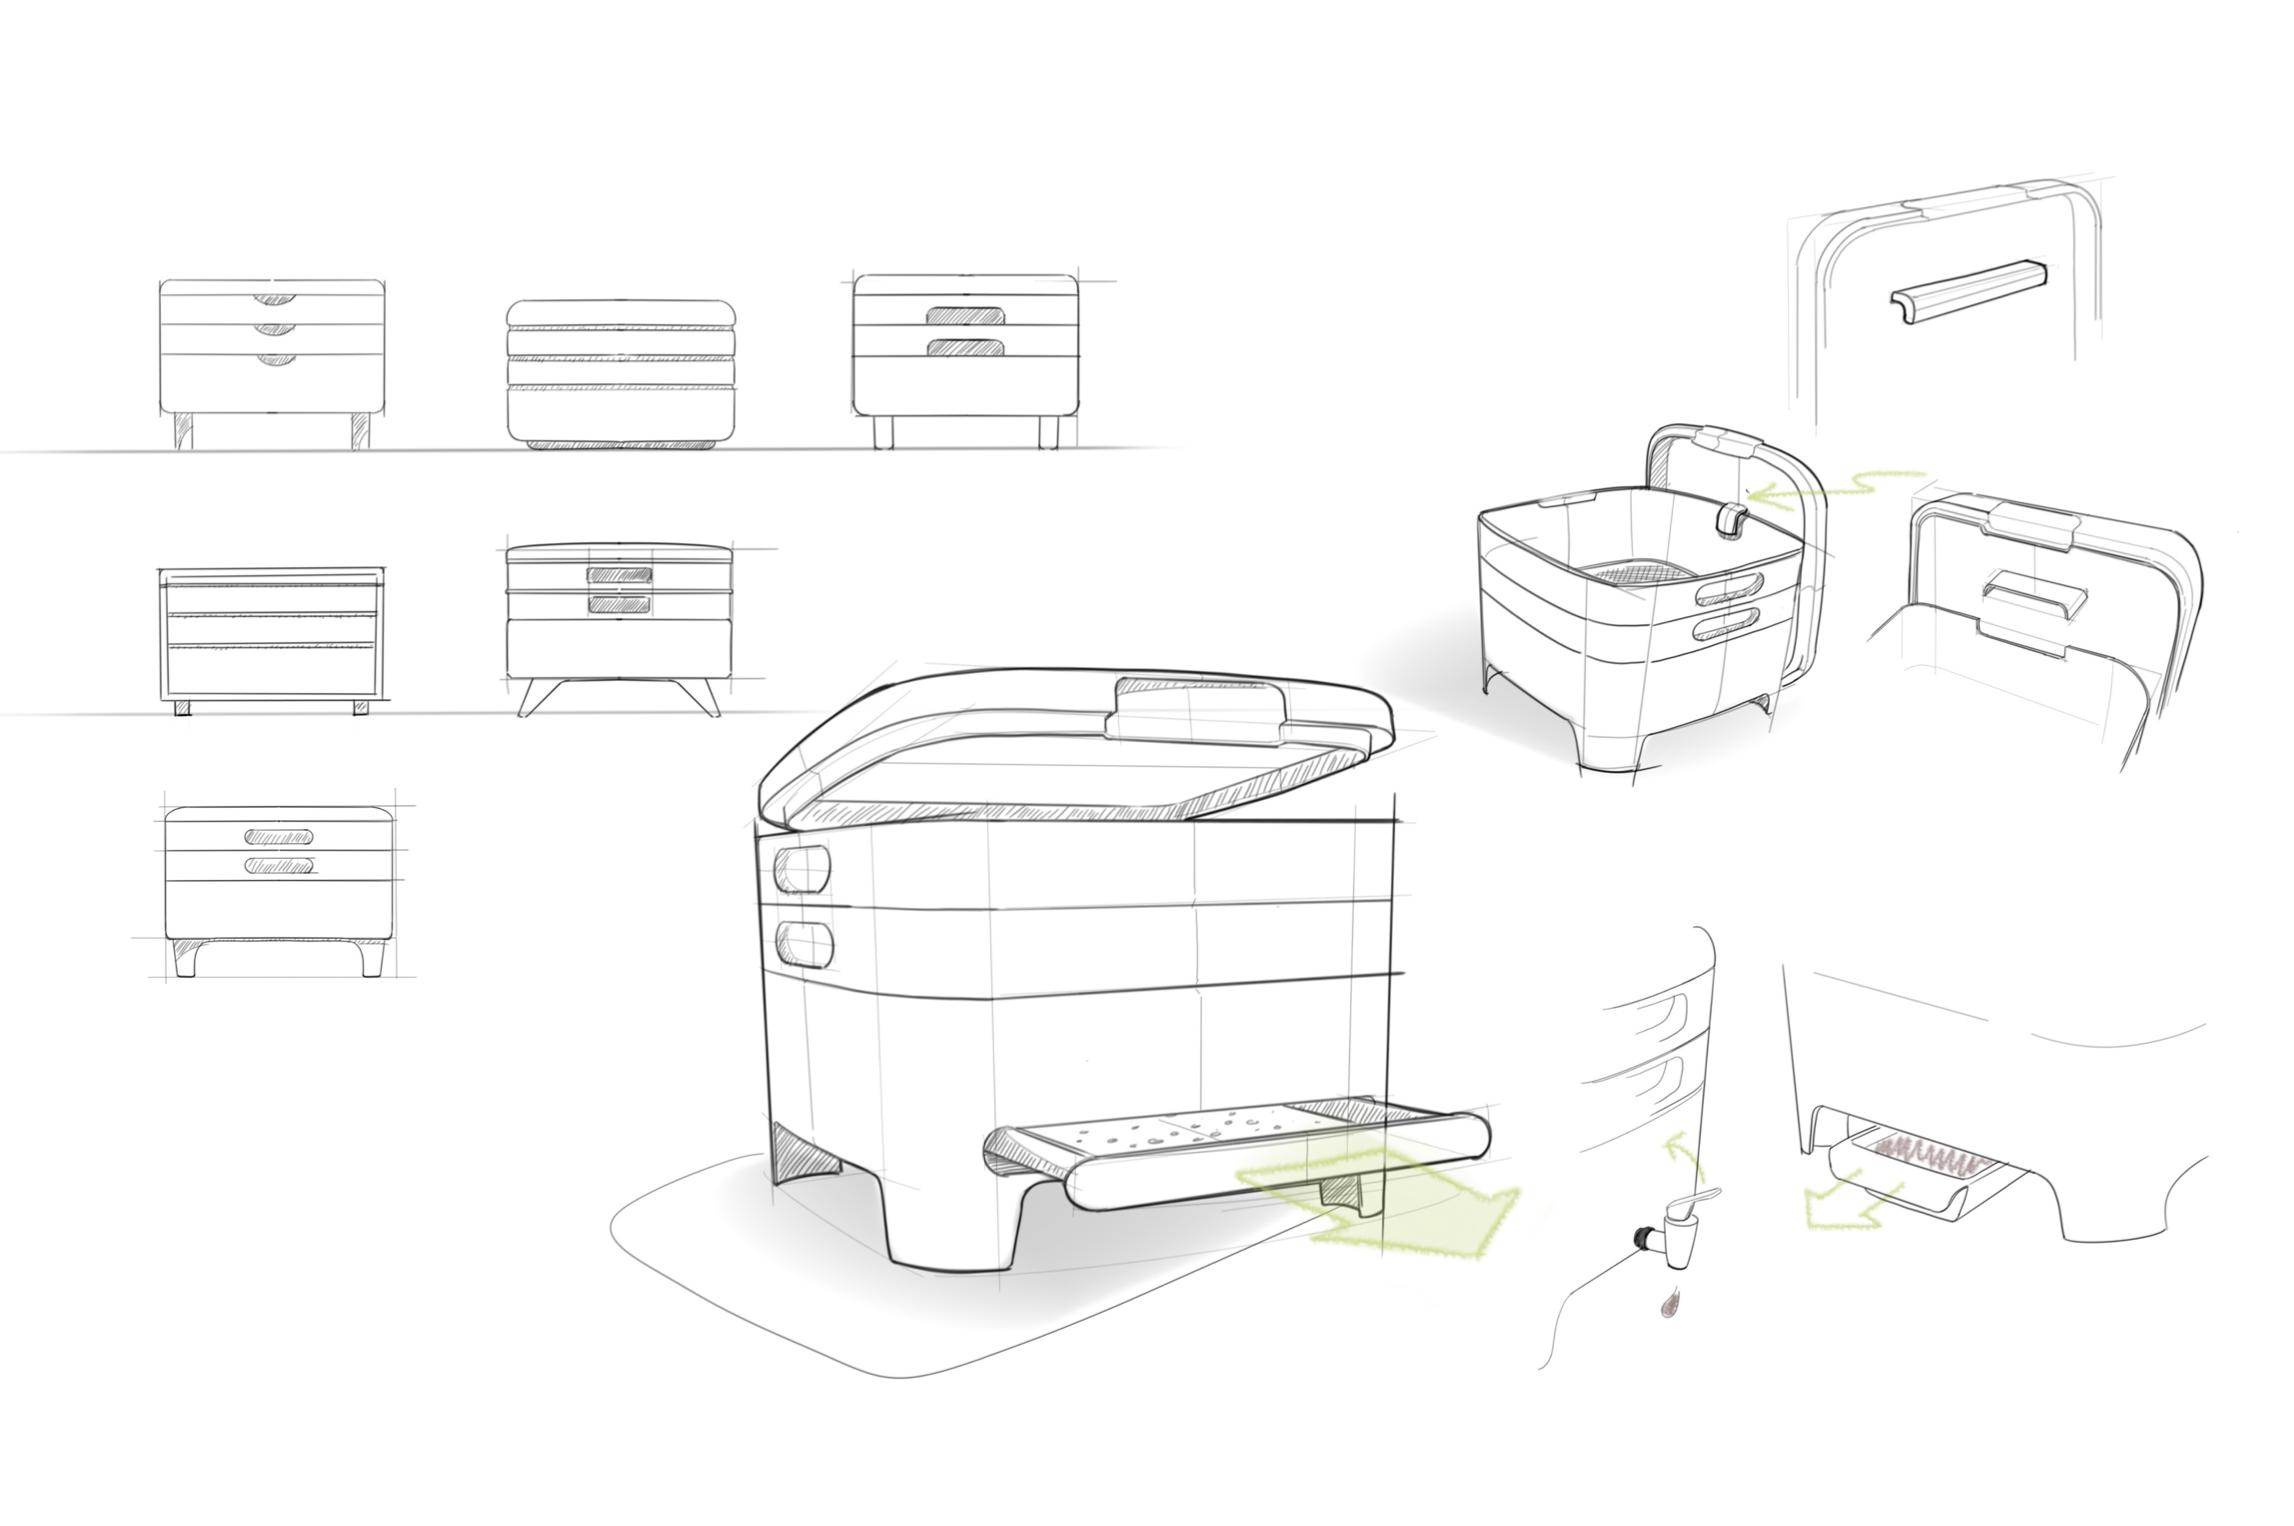 Farm-design-sketches